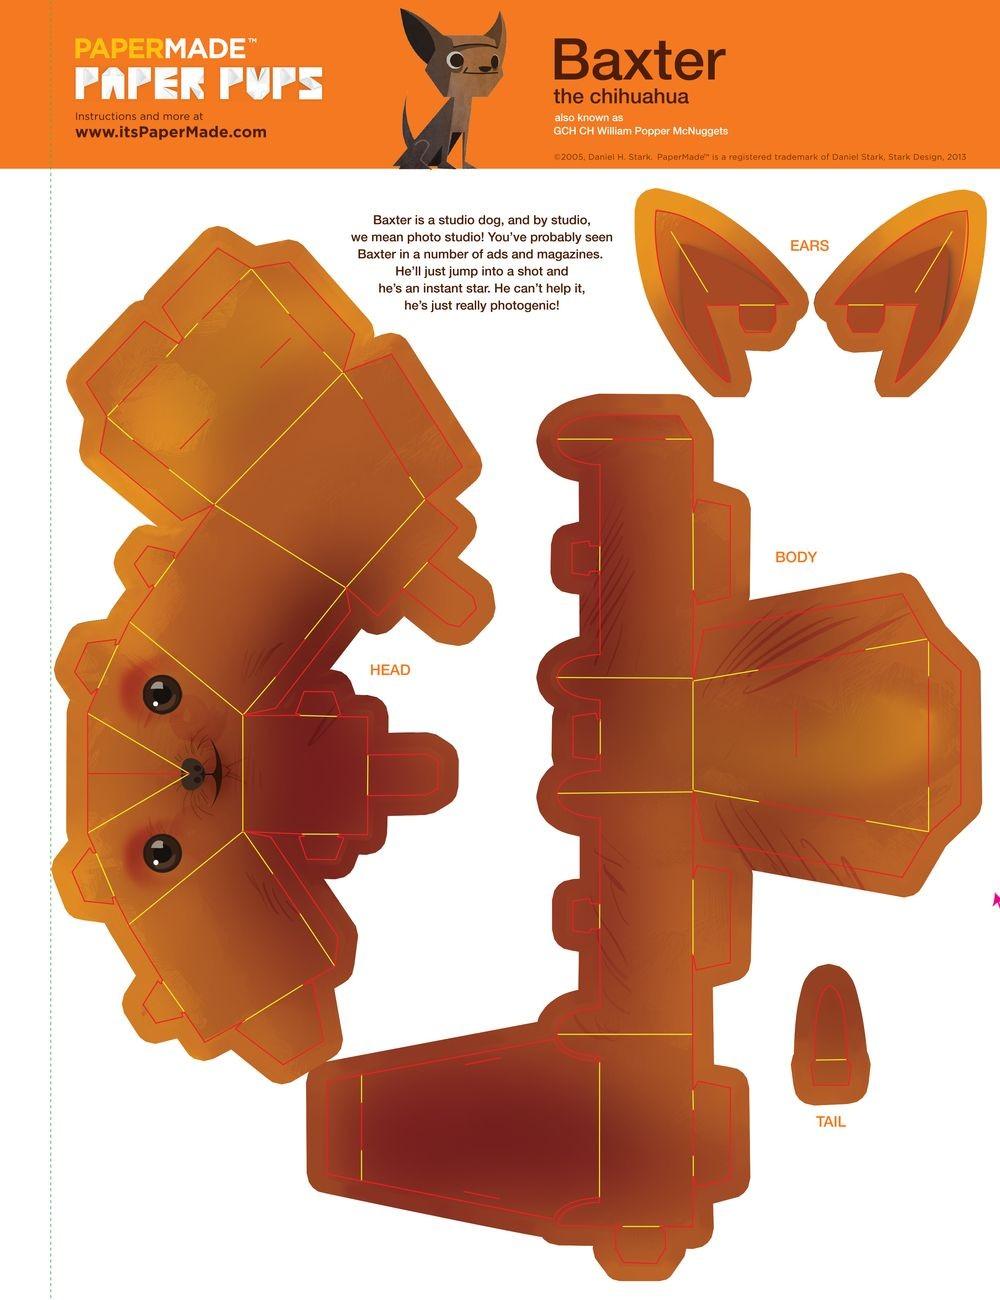 Ceiling Cat Papercraft 3d Papercraft Robots Google Search